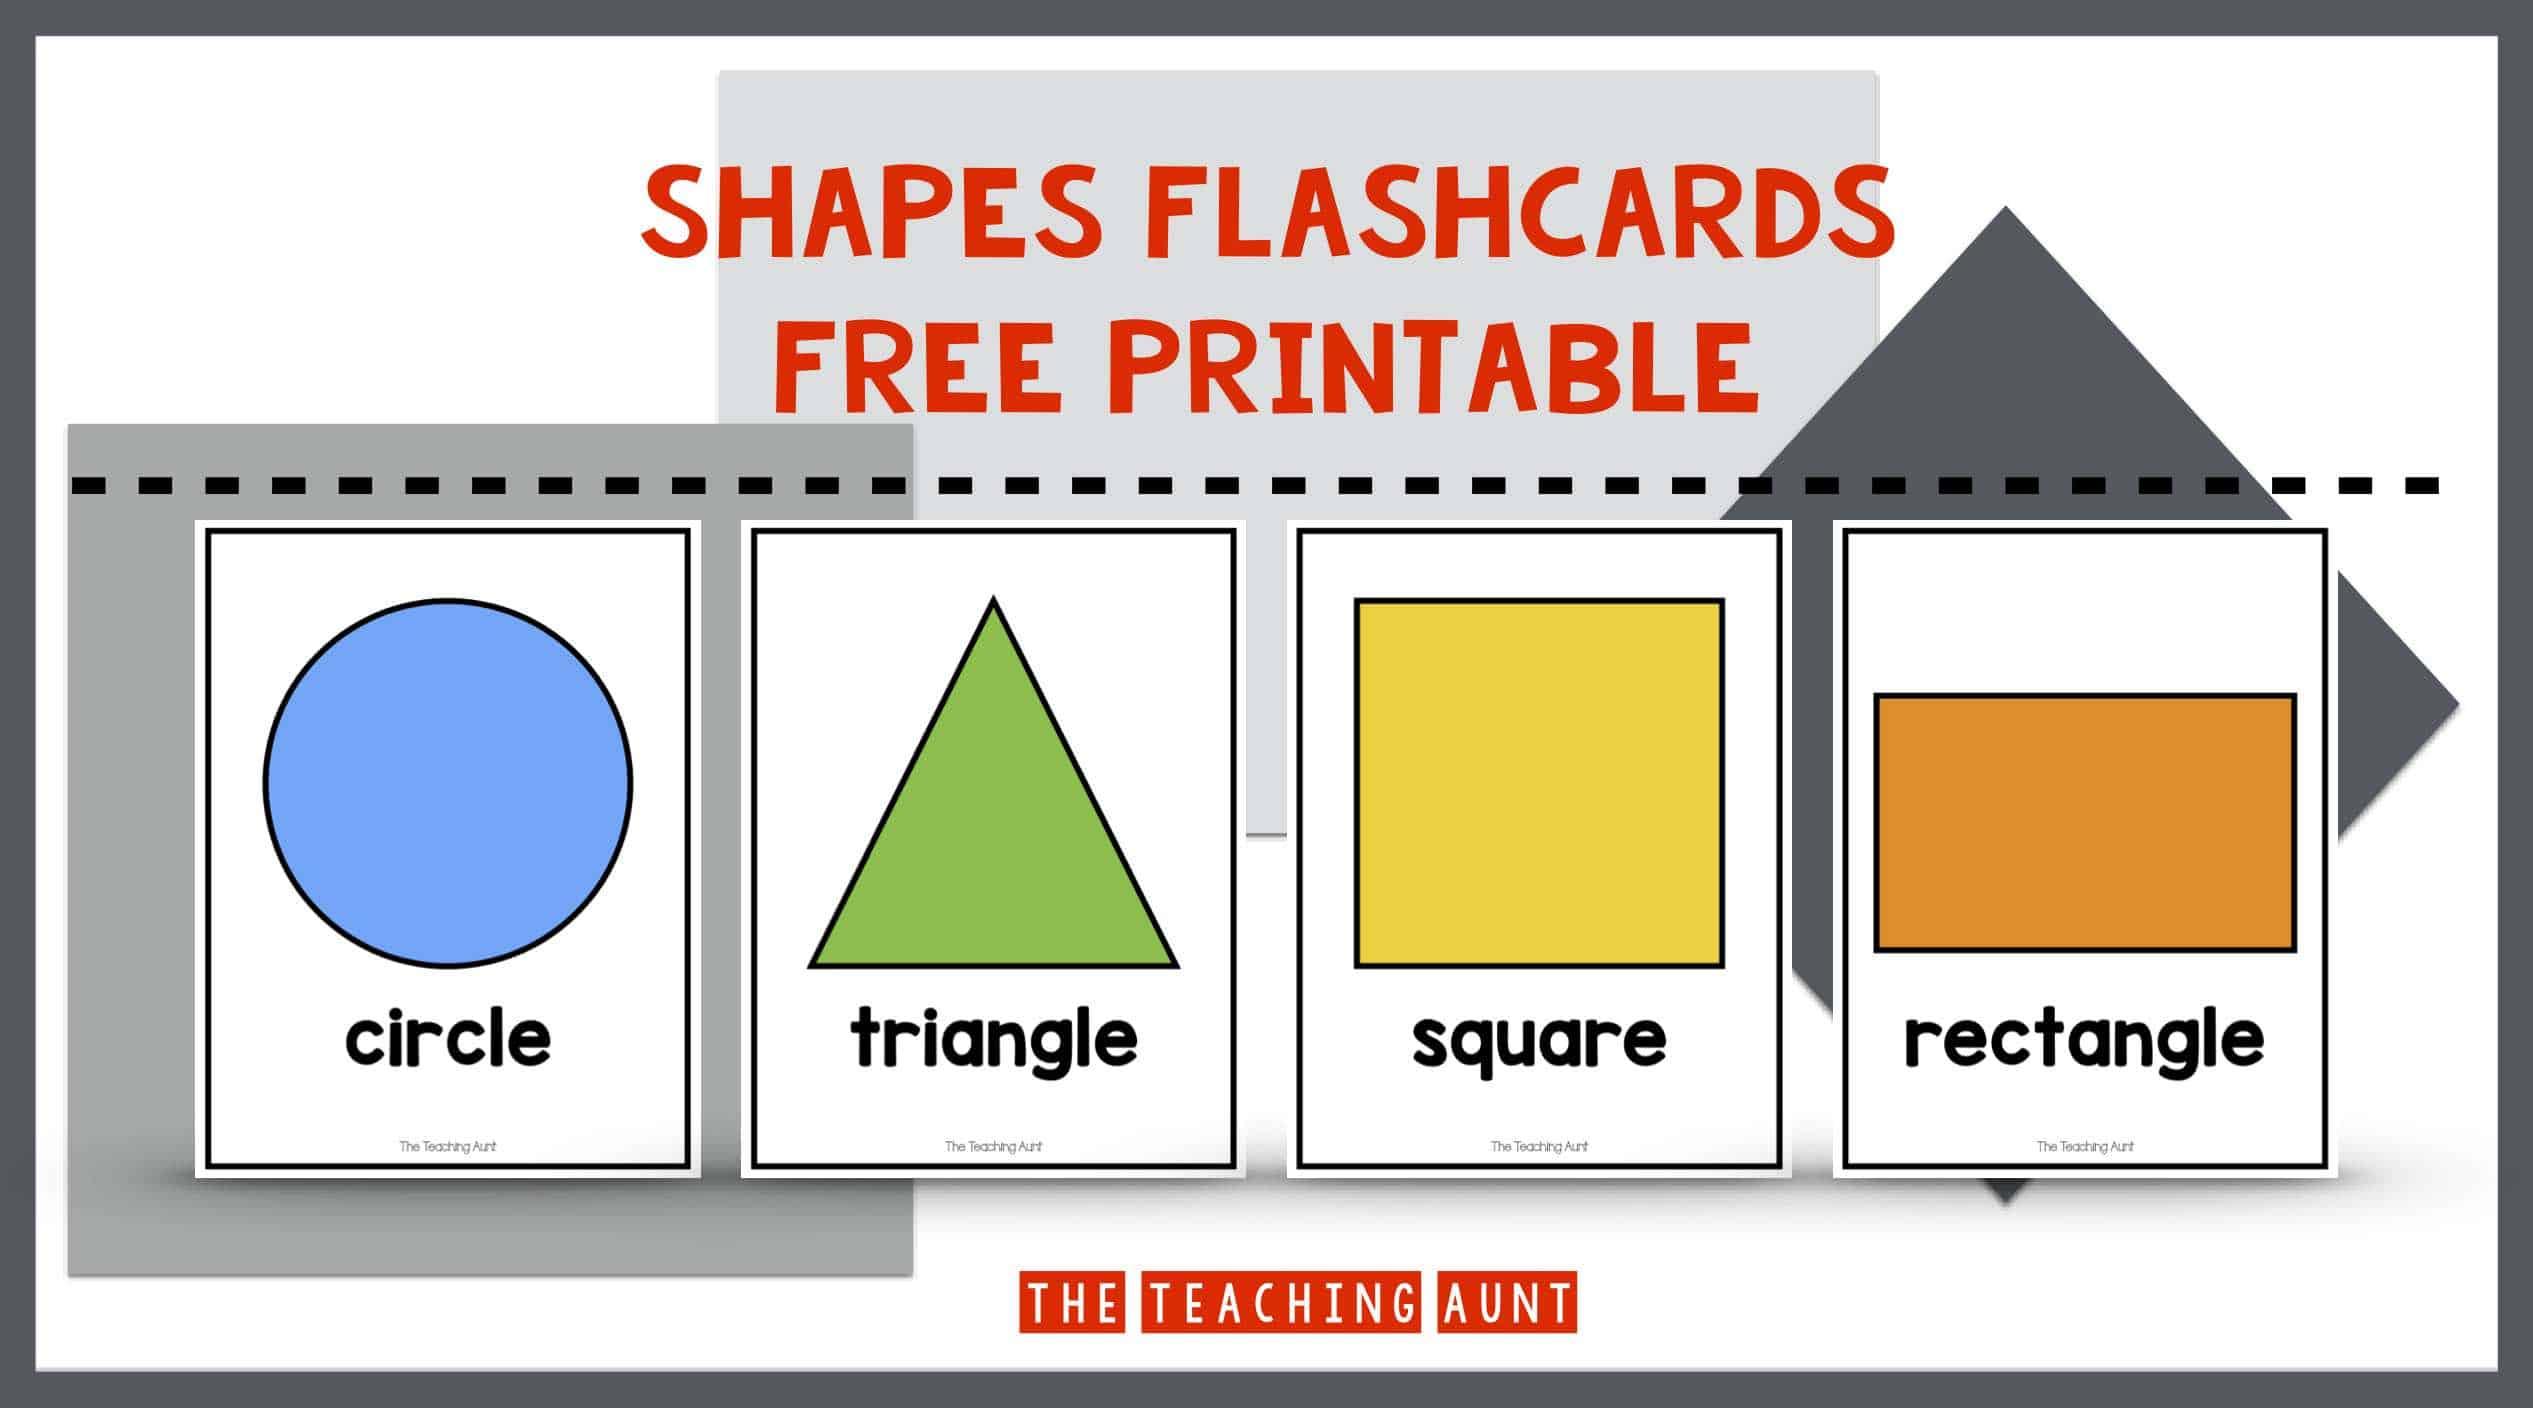 Shapes Flashcards Free Printable